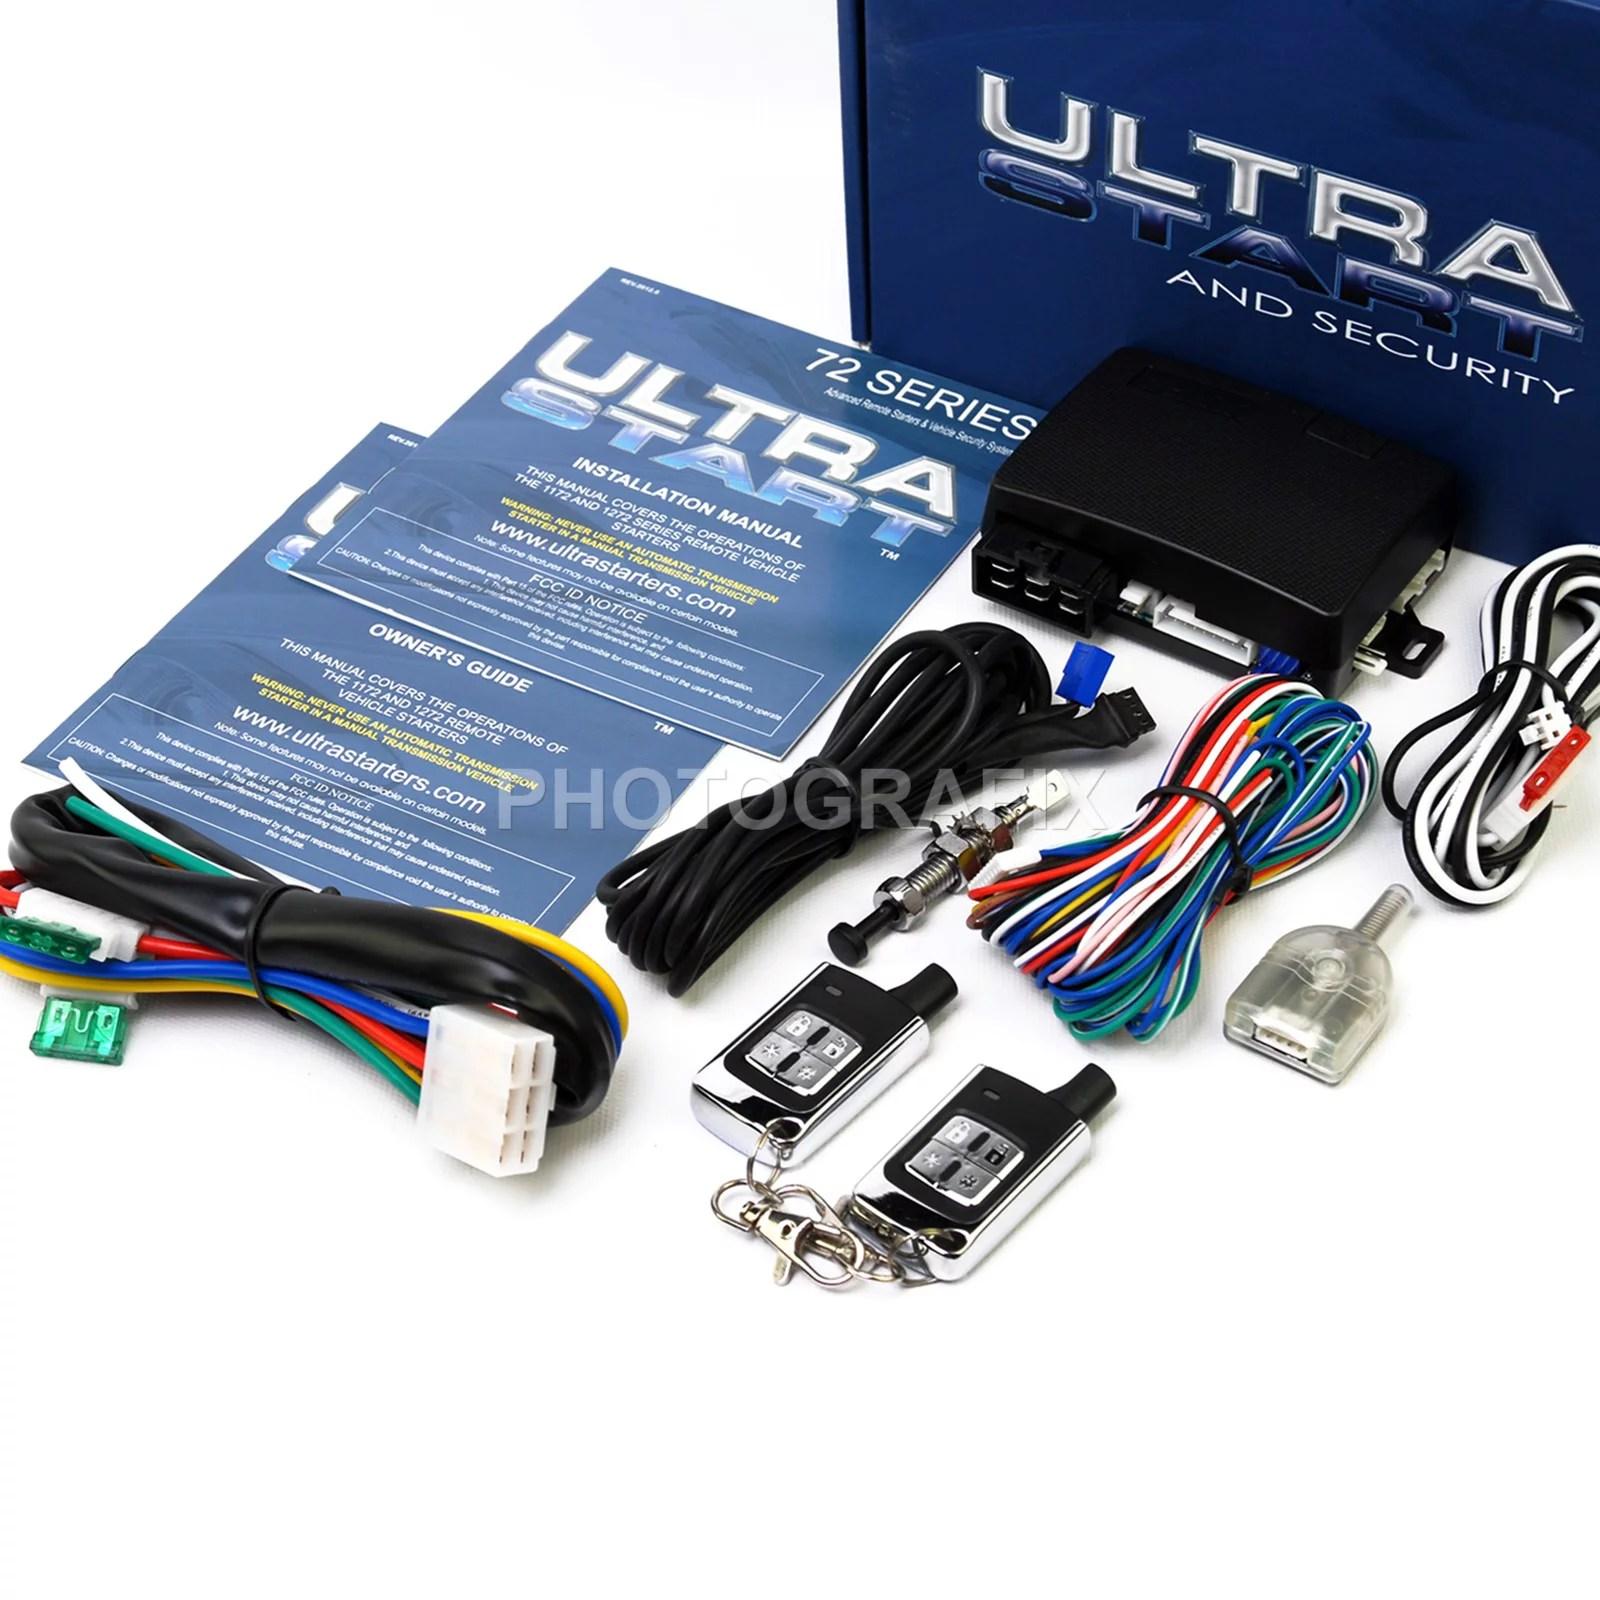 hight resolution of ultra start 1272 xr pro keyless auto remote car start starter diagrams start wiring remote oltrastart